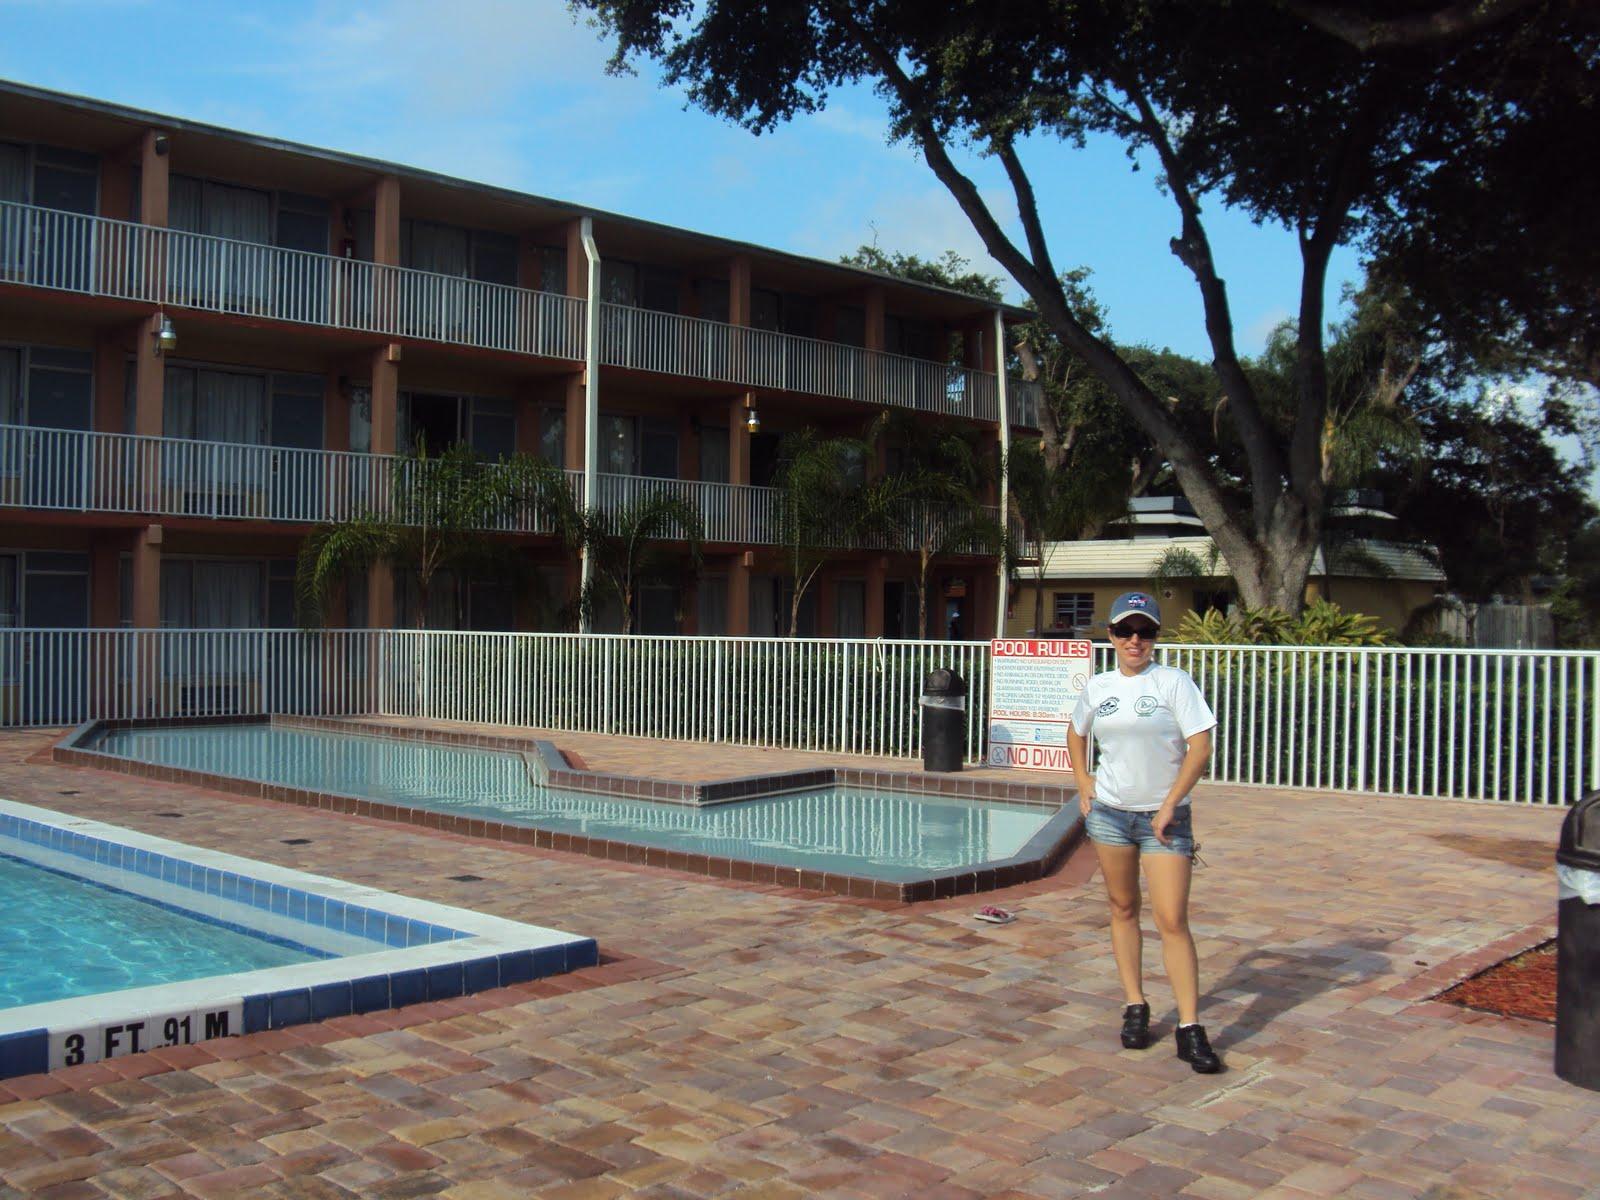 Hotel Howard Johnson Tropical Palms, em Kissimmee